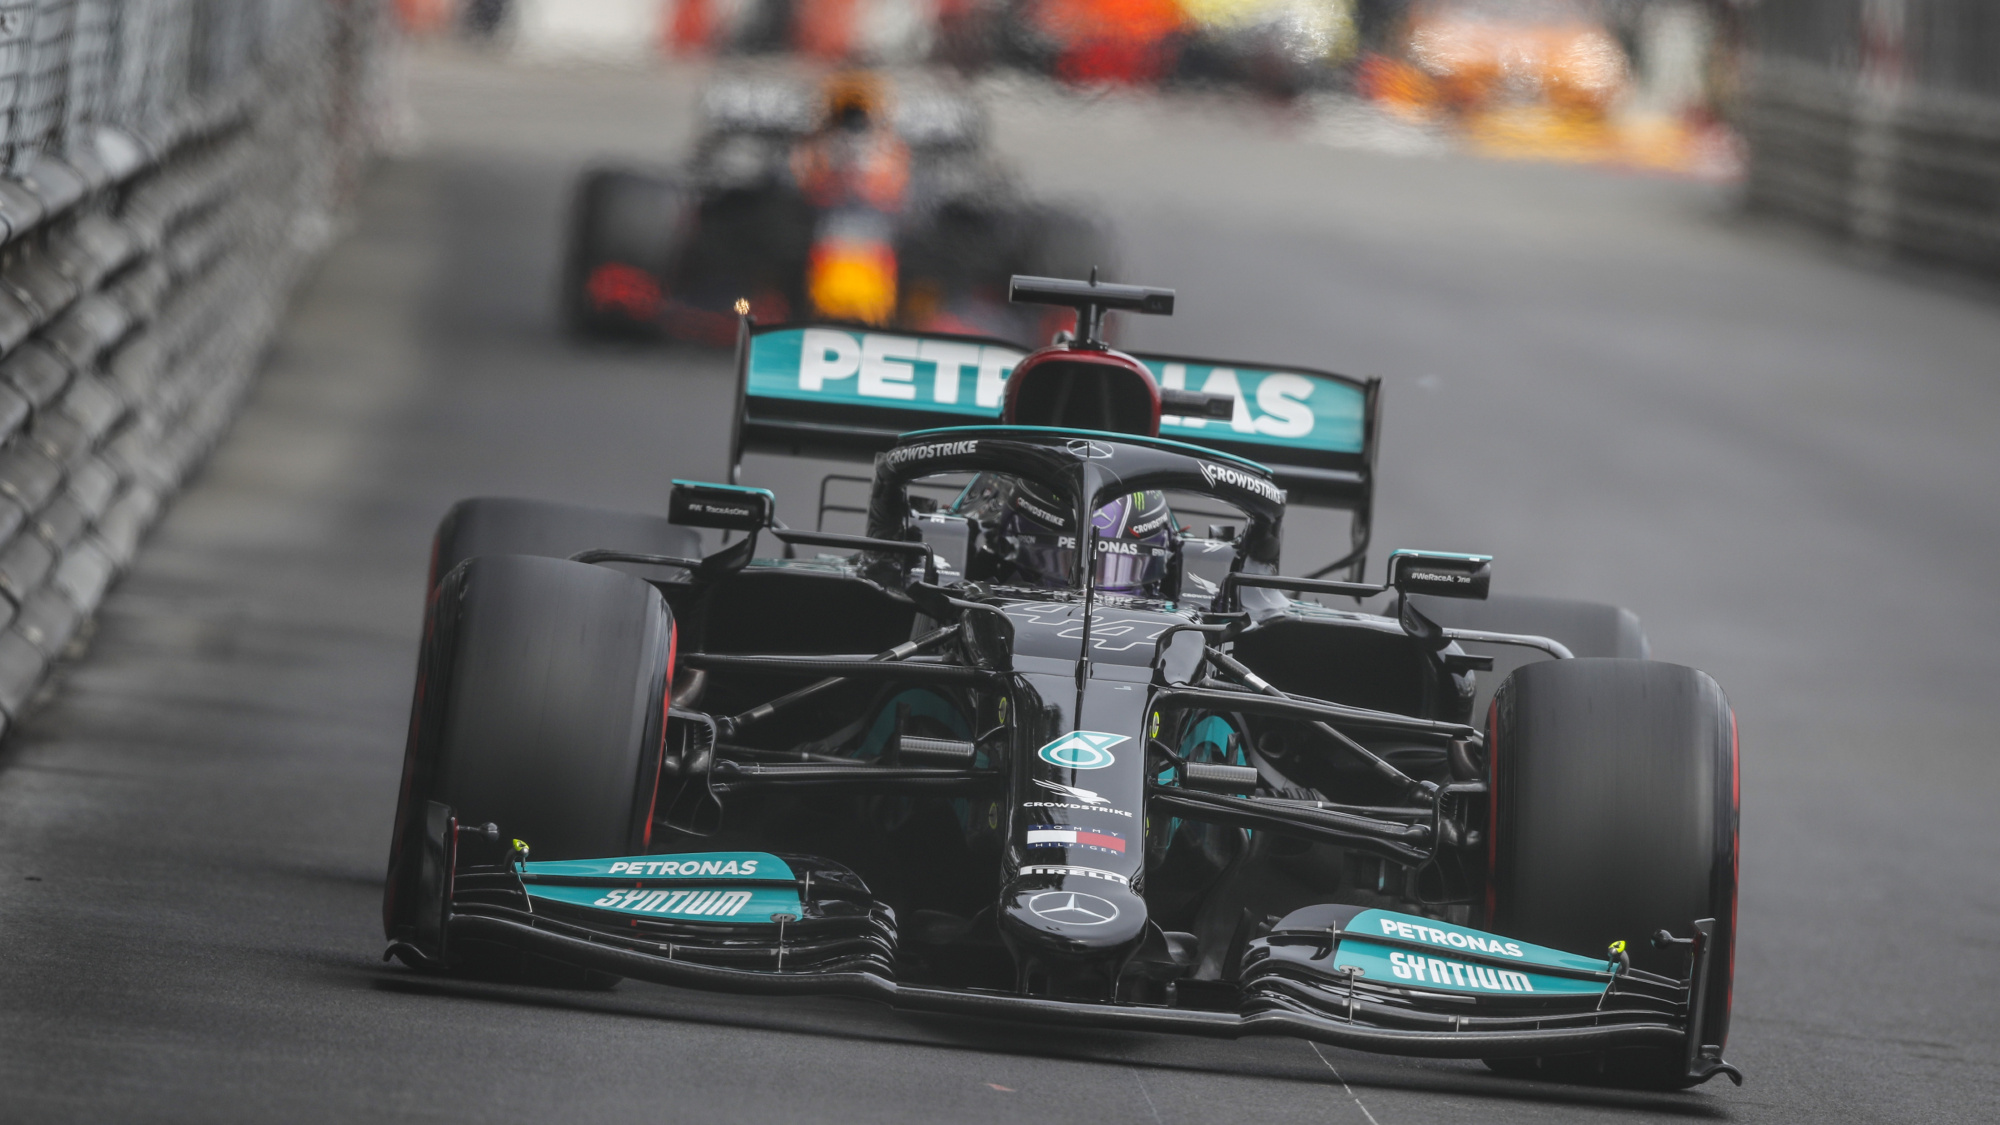 Lewis Hamilton, 2021 Monaco GP